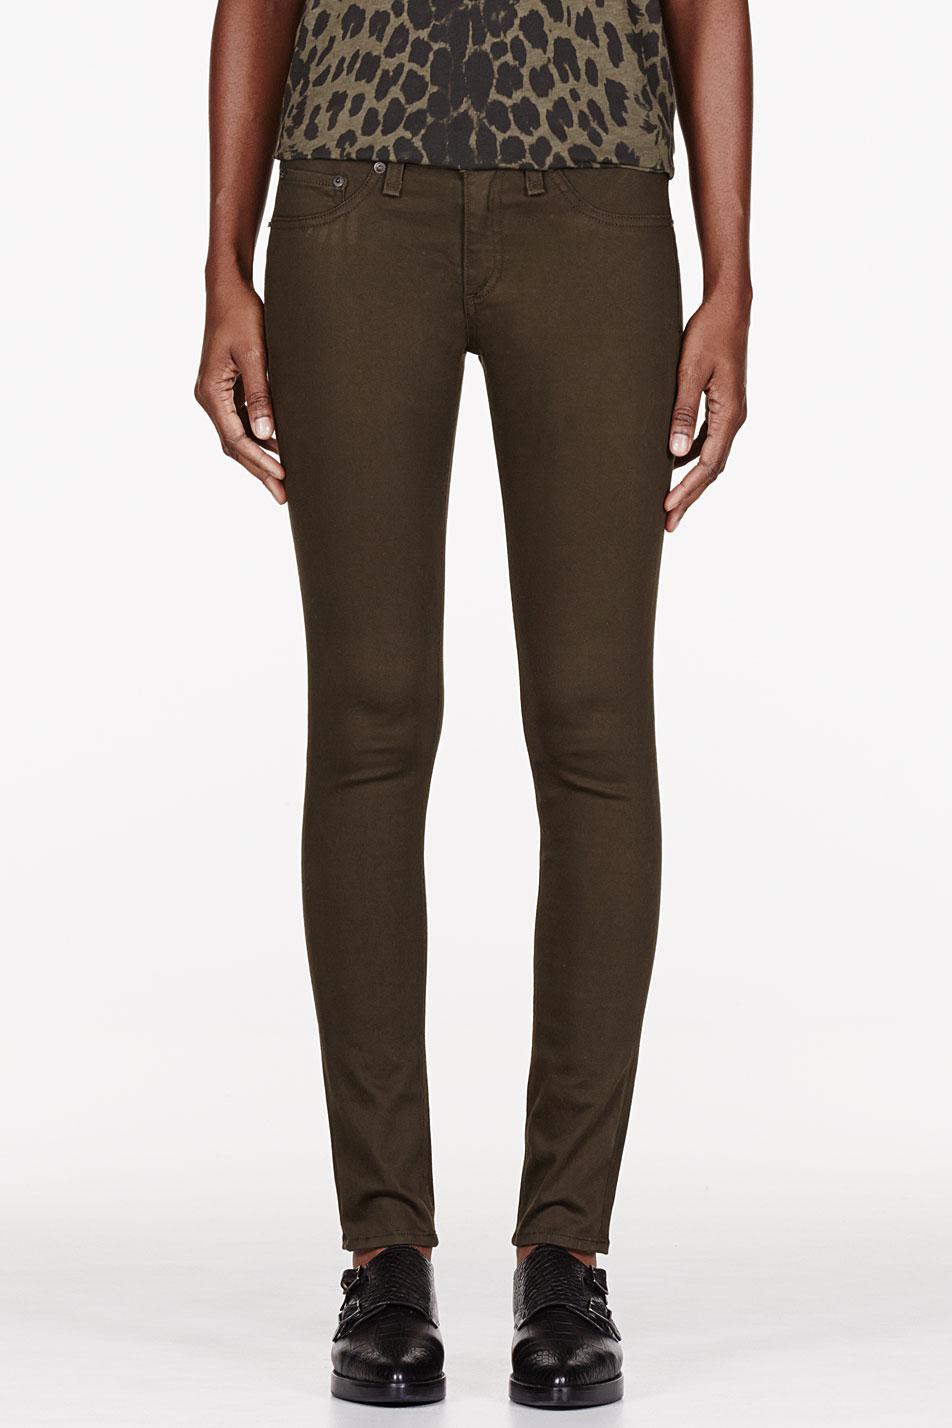 rag and bone olive sateen legging jeans